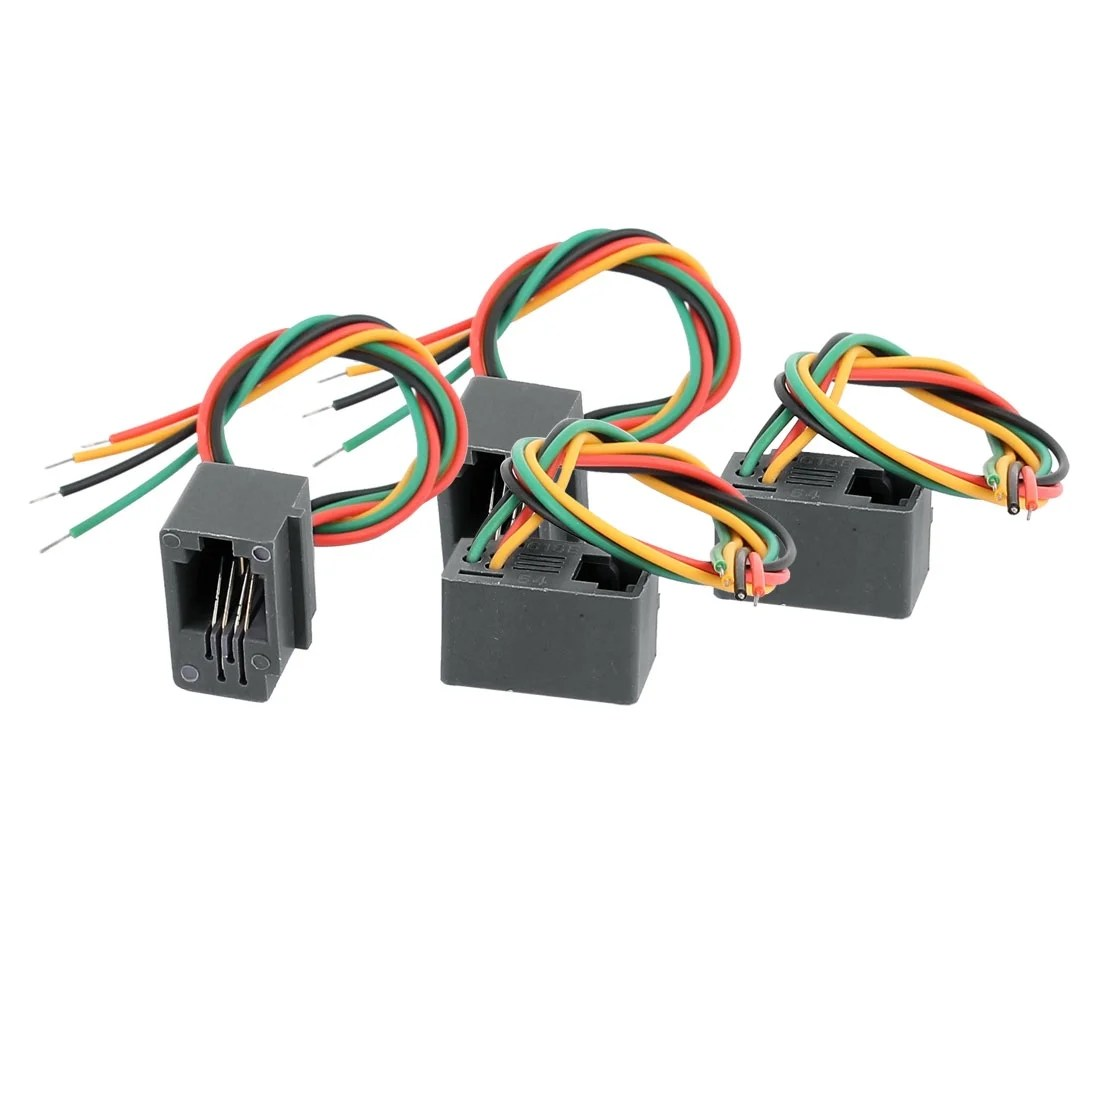 modular phone jack wiring diagram ibanez rg hsh rj22 free for you